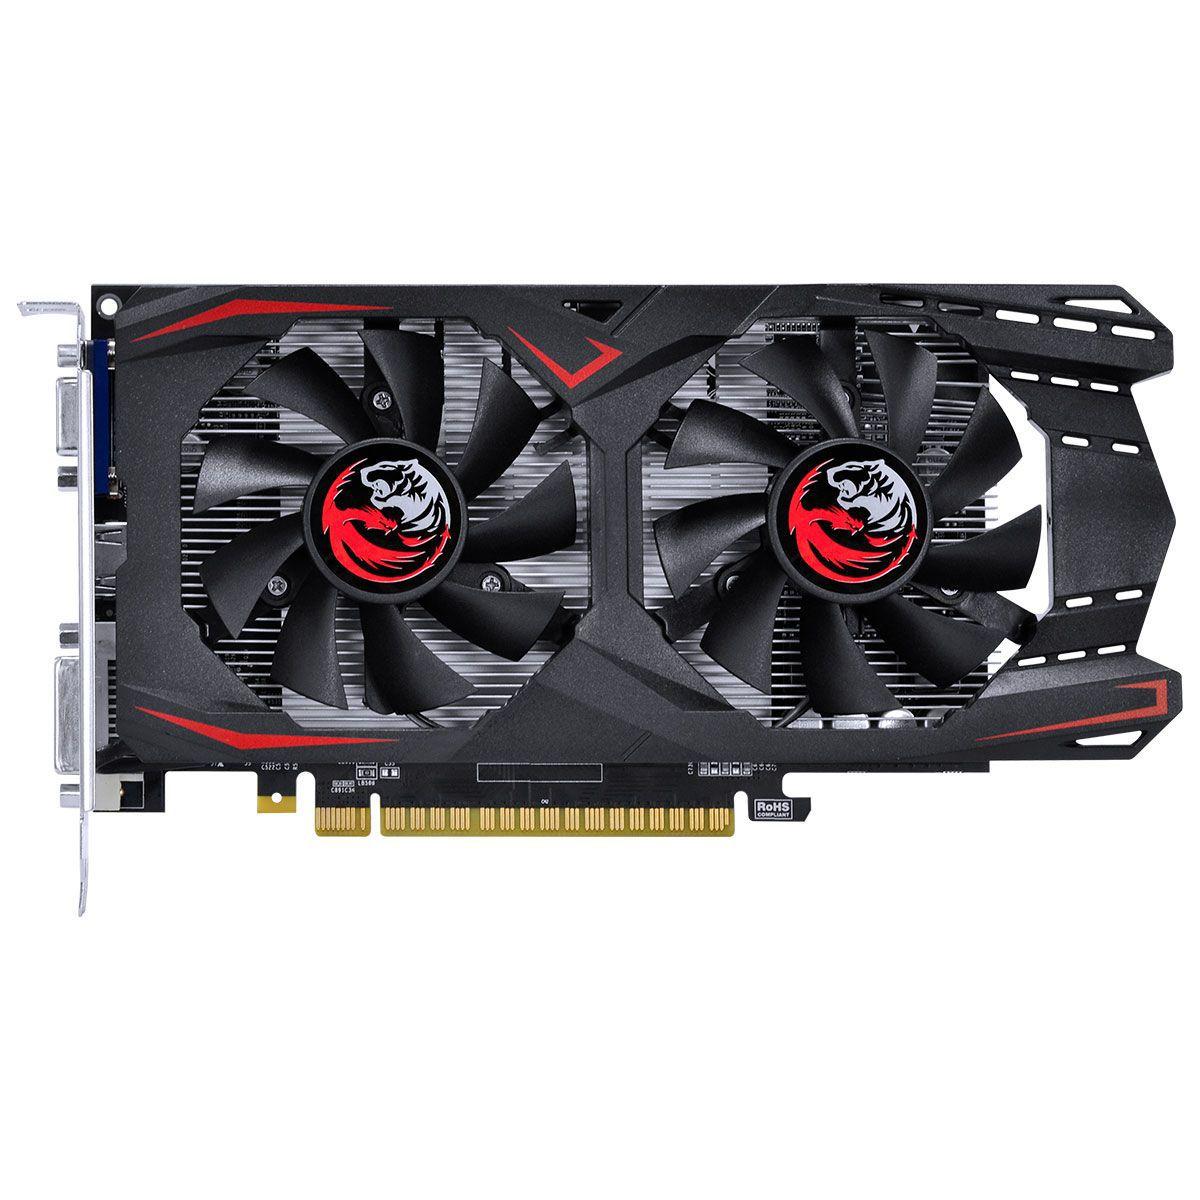 Placa de Vídeo GTS 450 GDDR5 2GB Pcyes Geforce